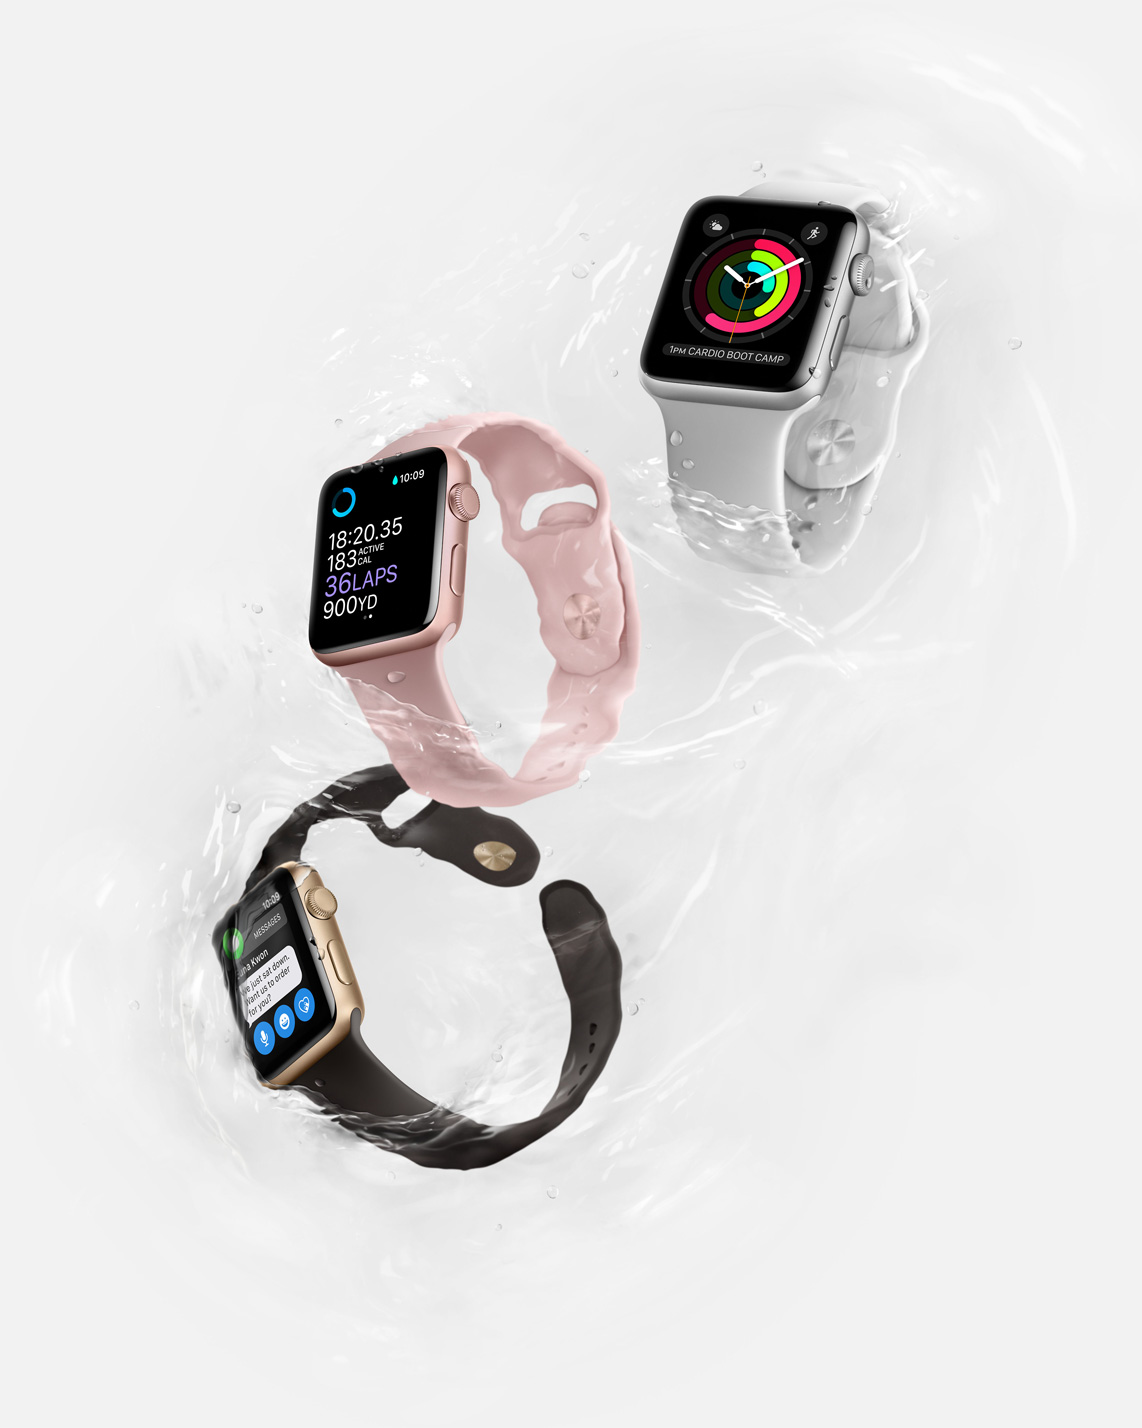 Apple Watch Series 2 (2)